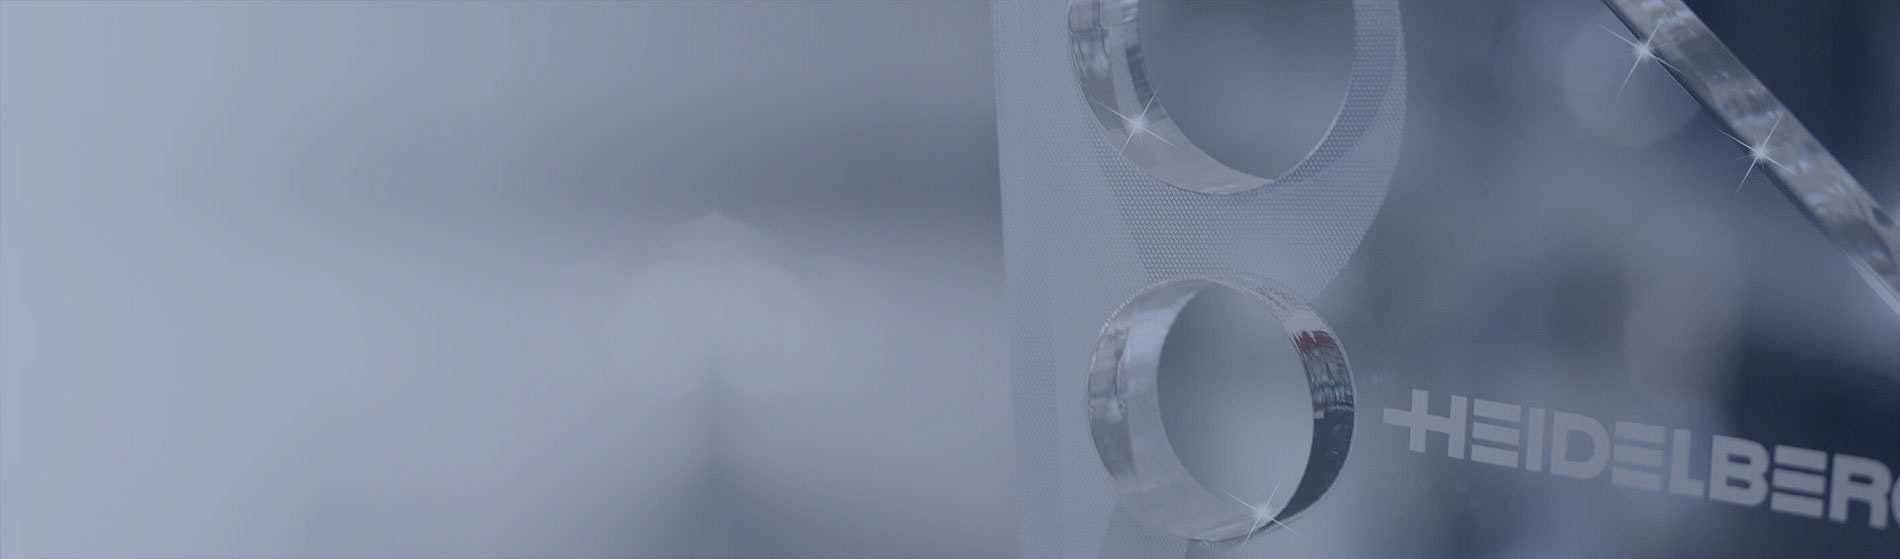 Acrylglas-Pokale